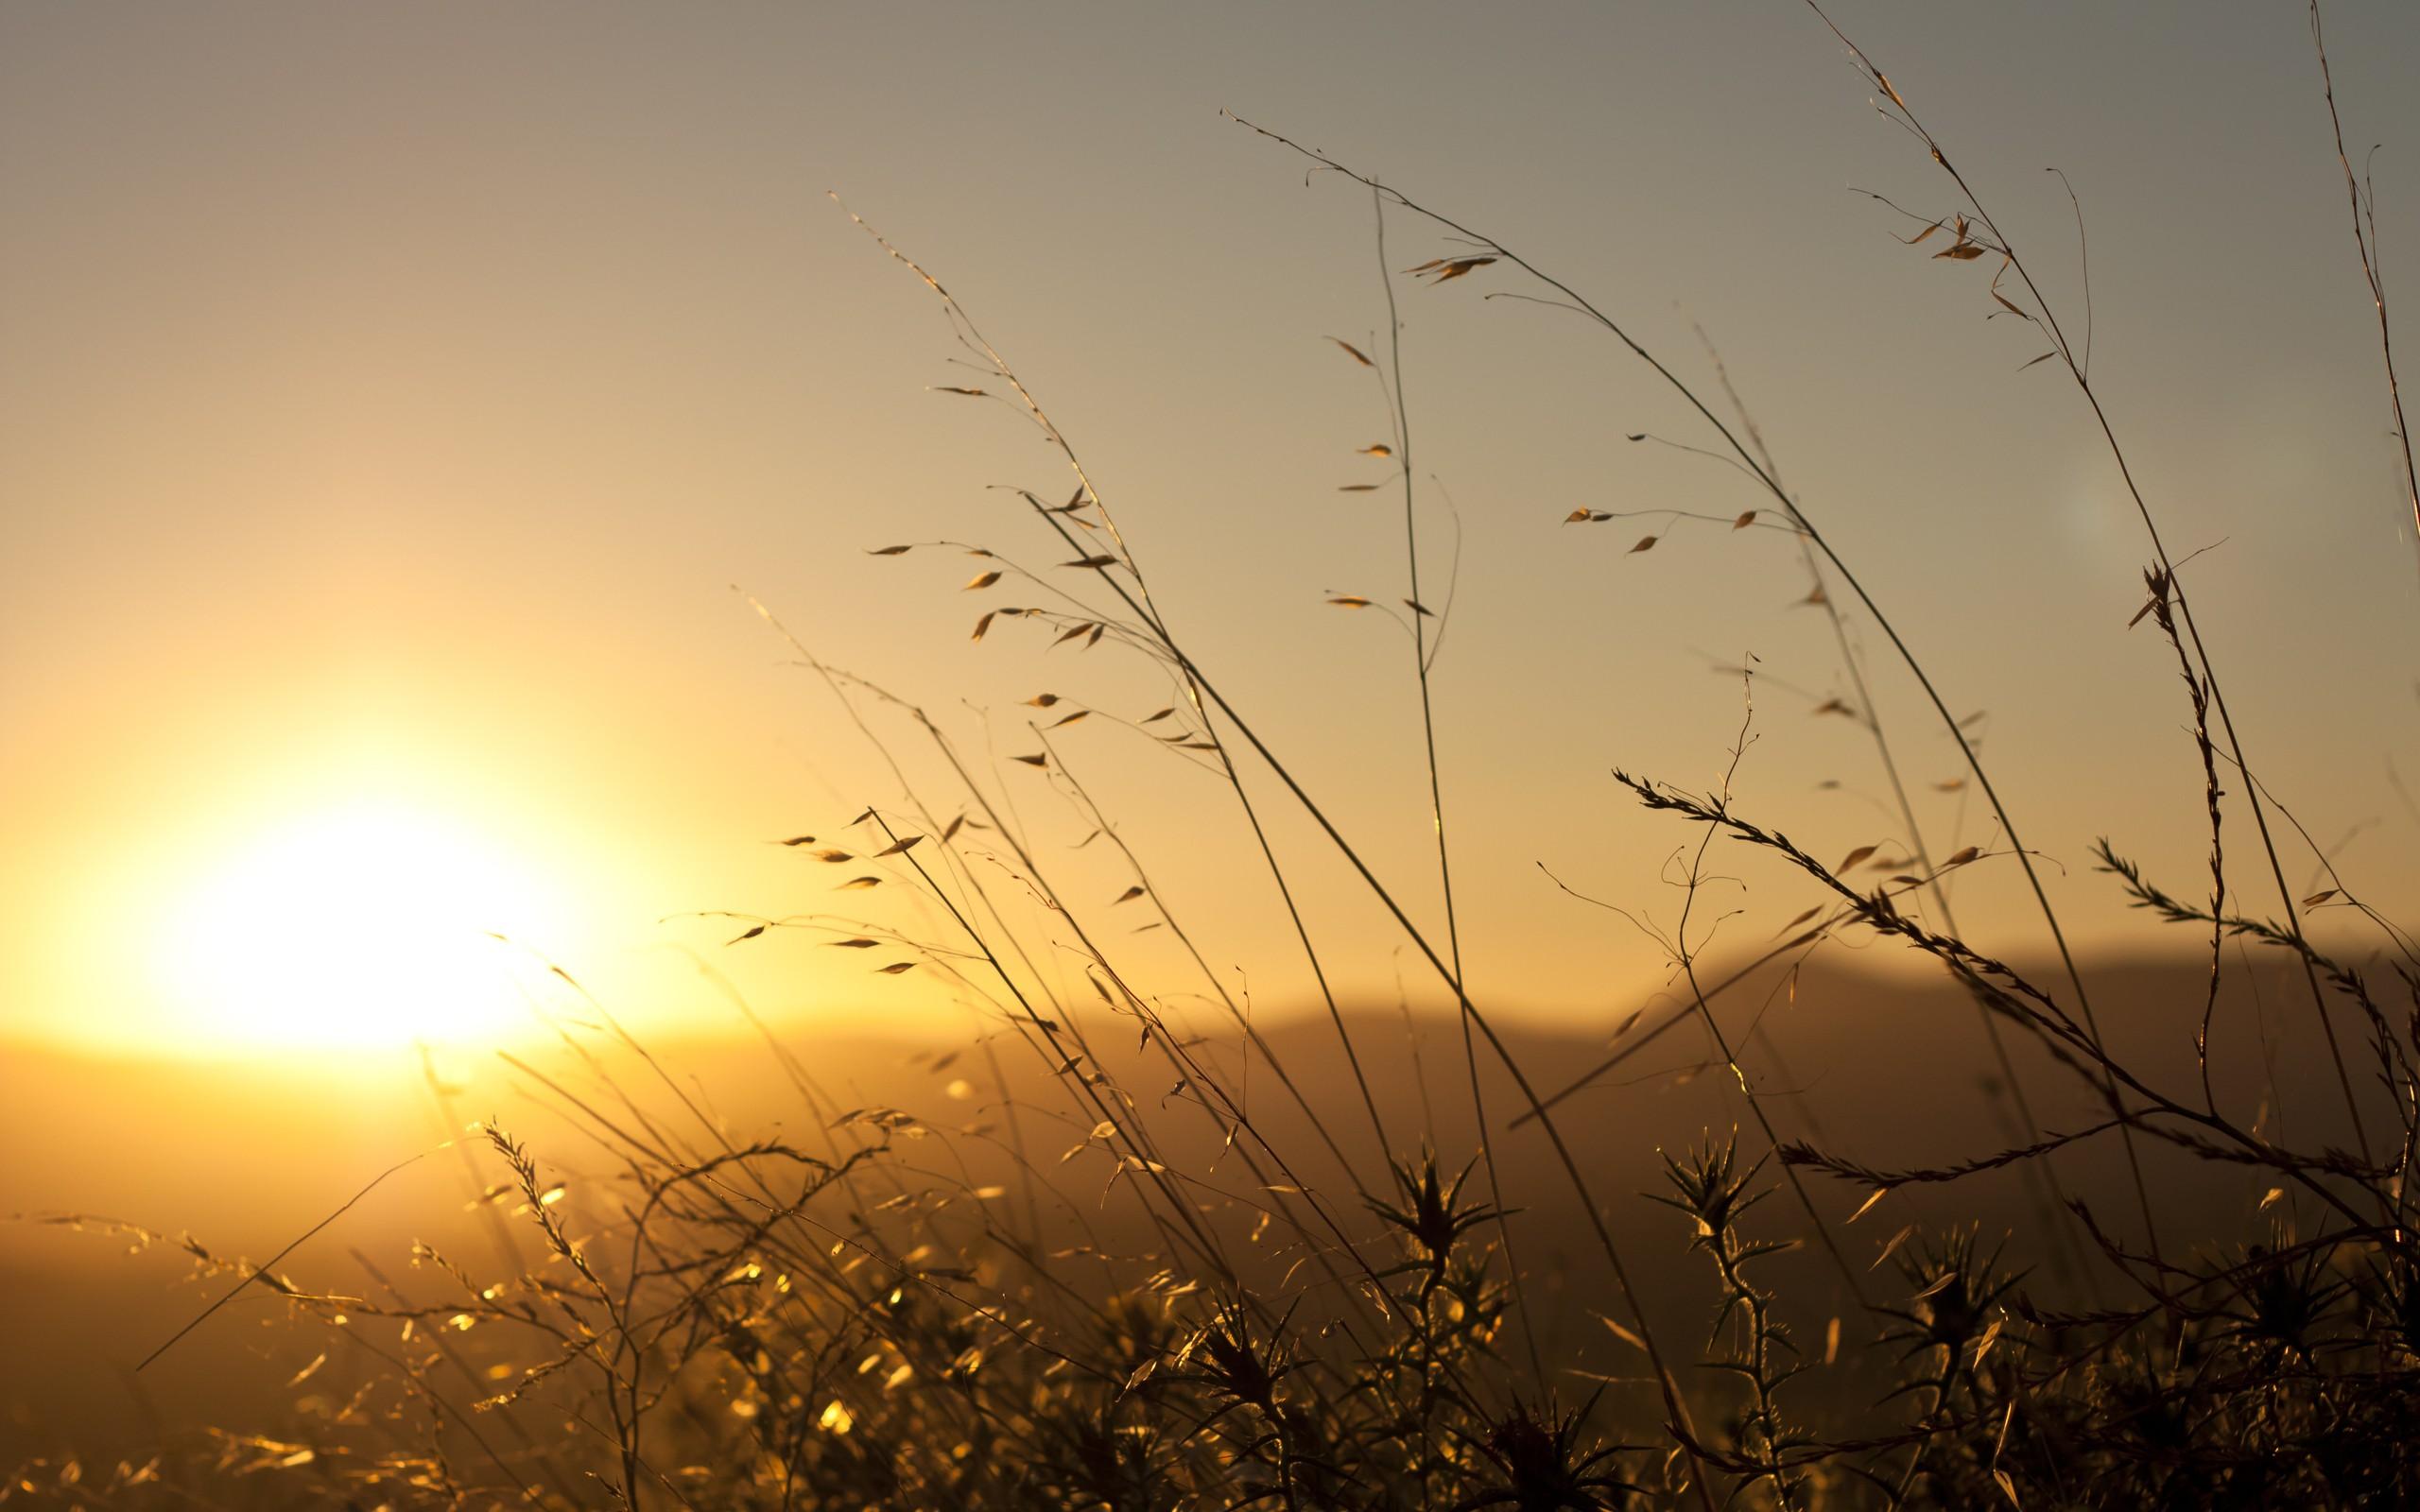 природа цветы трава мельниц восход солнце  № 2556715 бесплатно